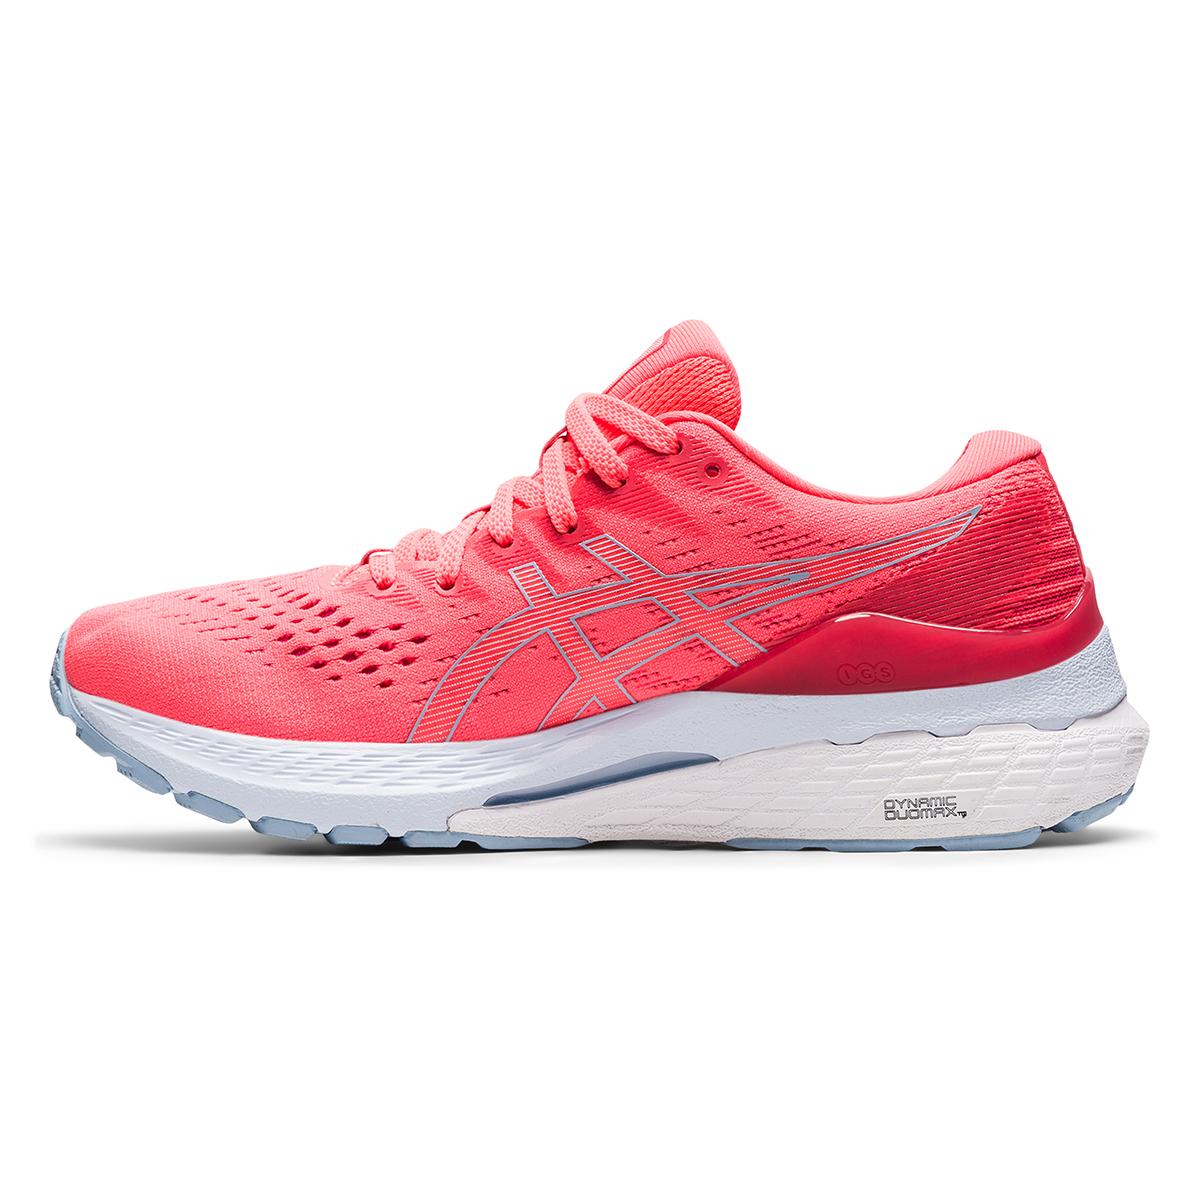 Women's Asics Gel-Kayano 28 Running Shoe - Color: Blazing Coral - Size: 5 - Width: Regular, Blazing Coral, large, image 2